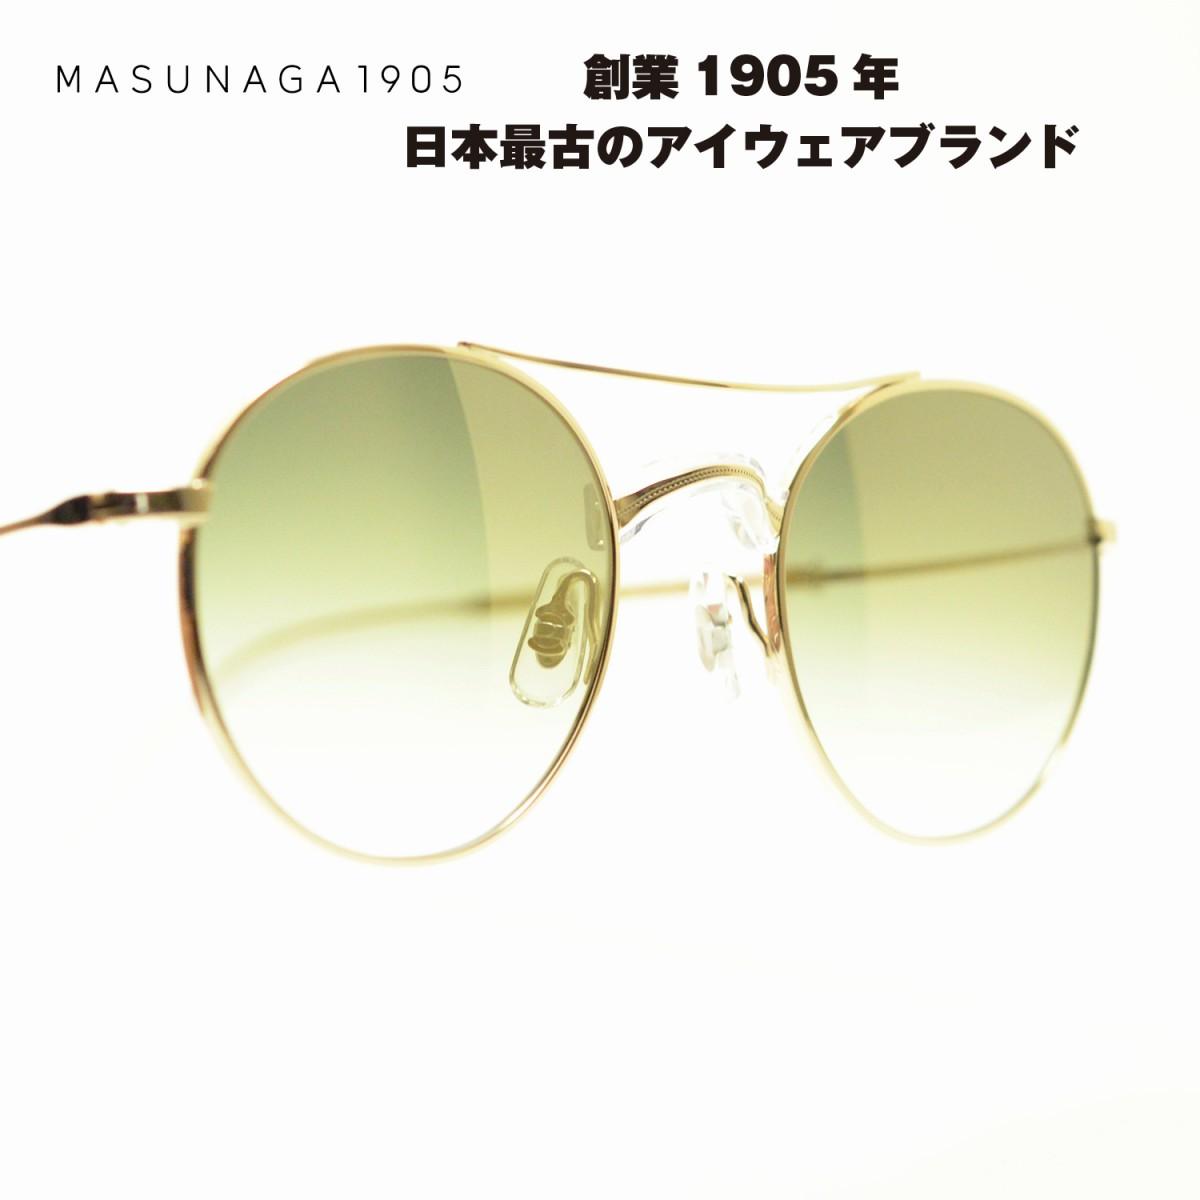 MASUNAGA GMS-106SG col-S42 GP/CRYSTALメガネ 眼鏡 めがね メンズ レディース おしゃれ ブランド 人気 おすすめ フレーム 流行り 度付き レンズ サングラス